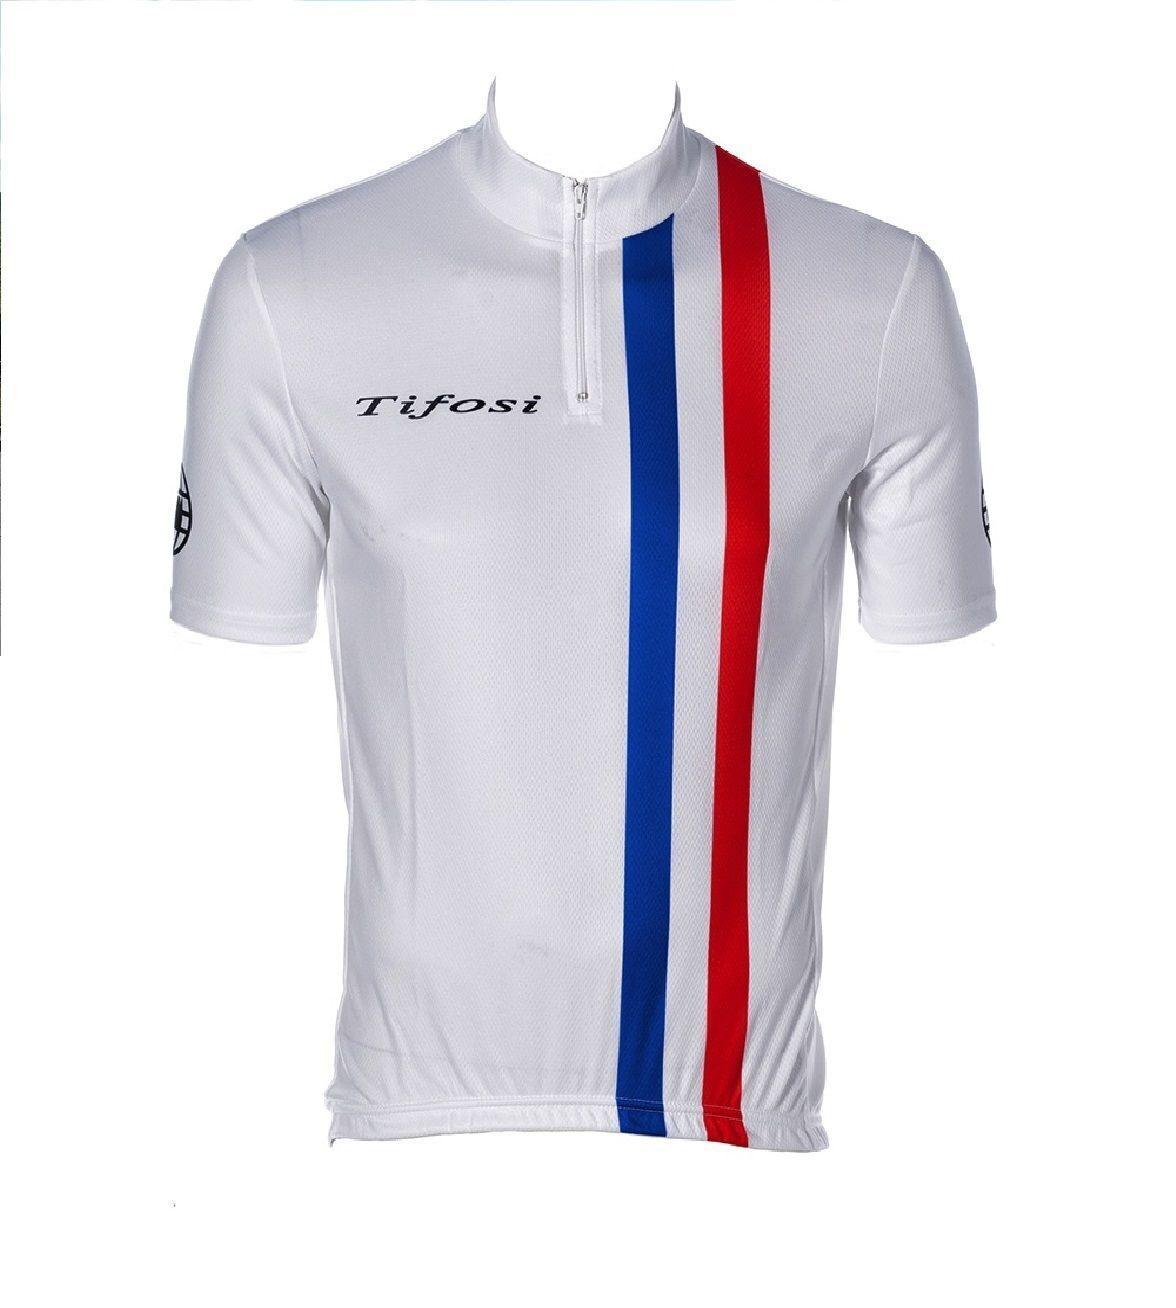 Nalini Tifosi Retro Short Sleeve Cycling Jersey S-M-XL